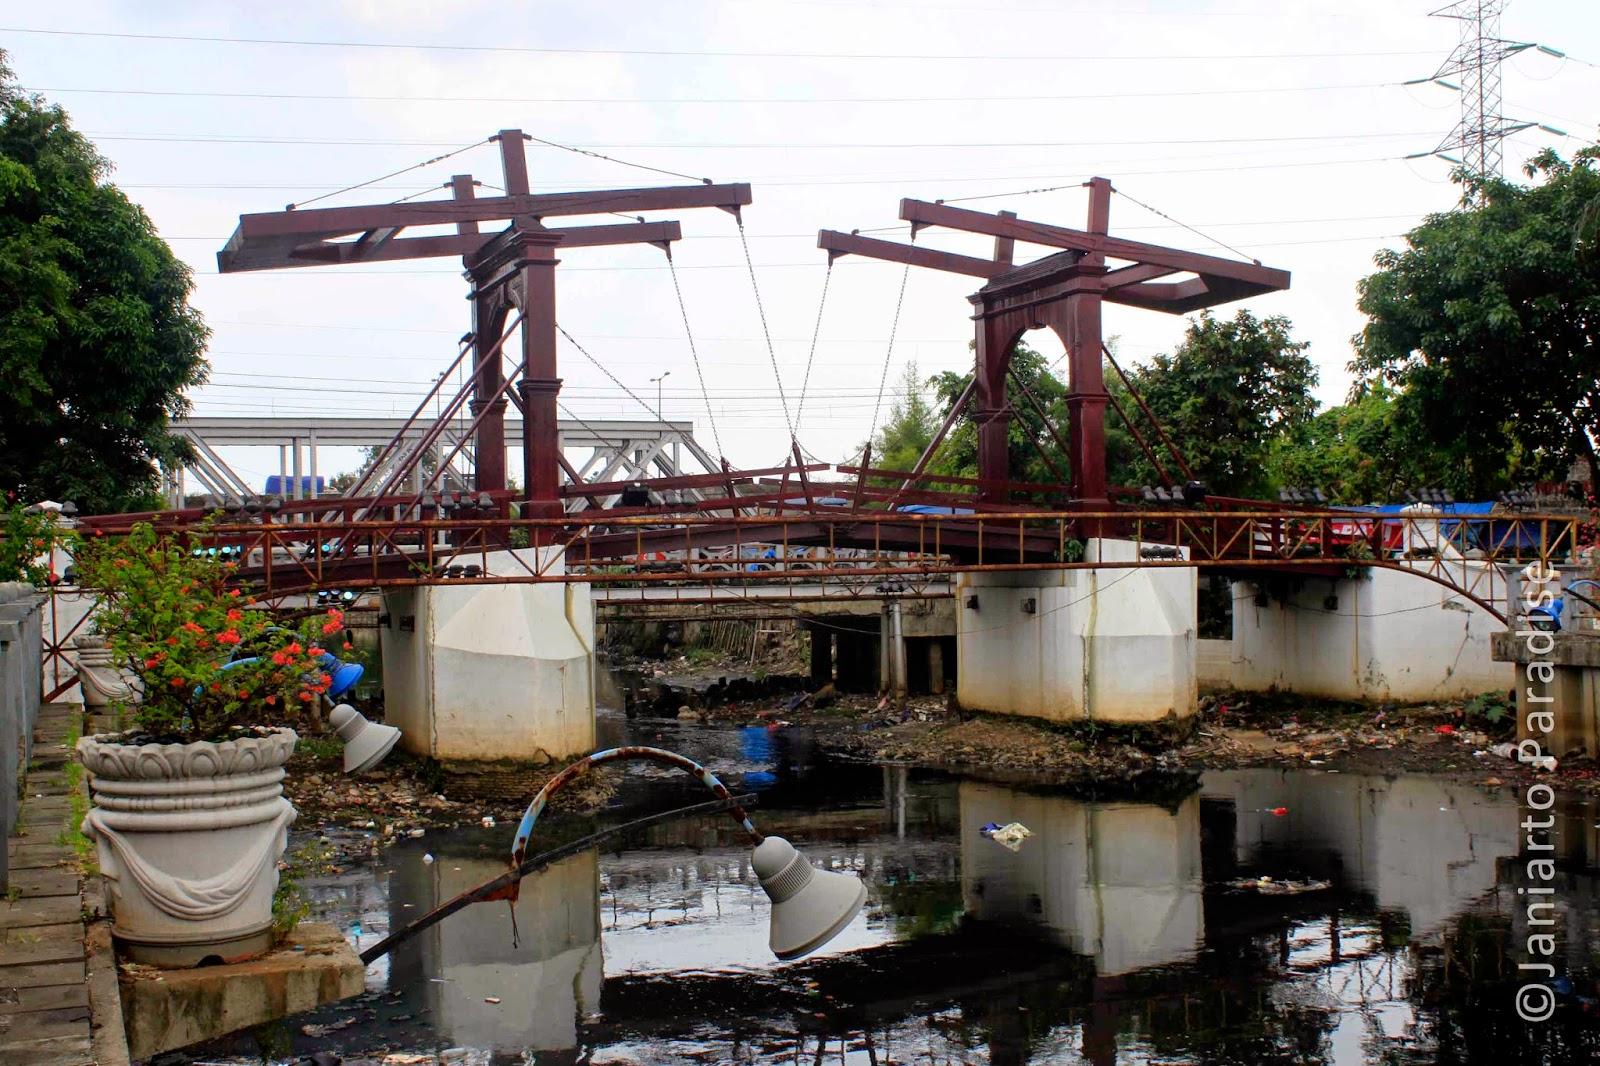 Kota Inta Bridge - Jakarta Old Town